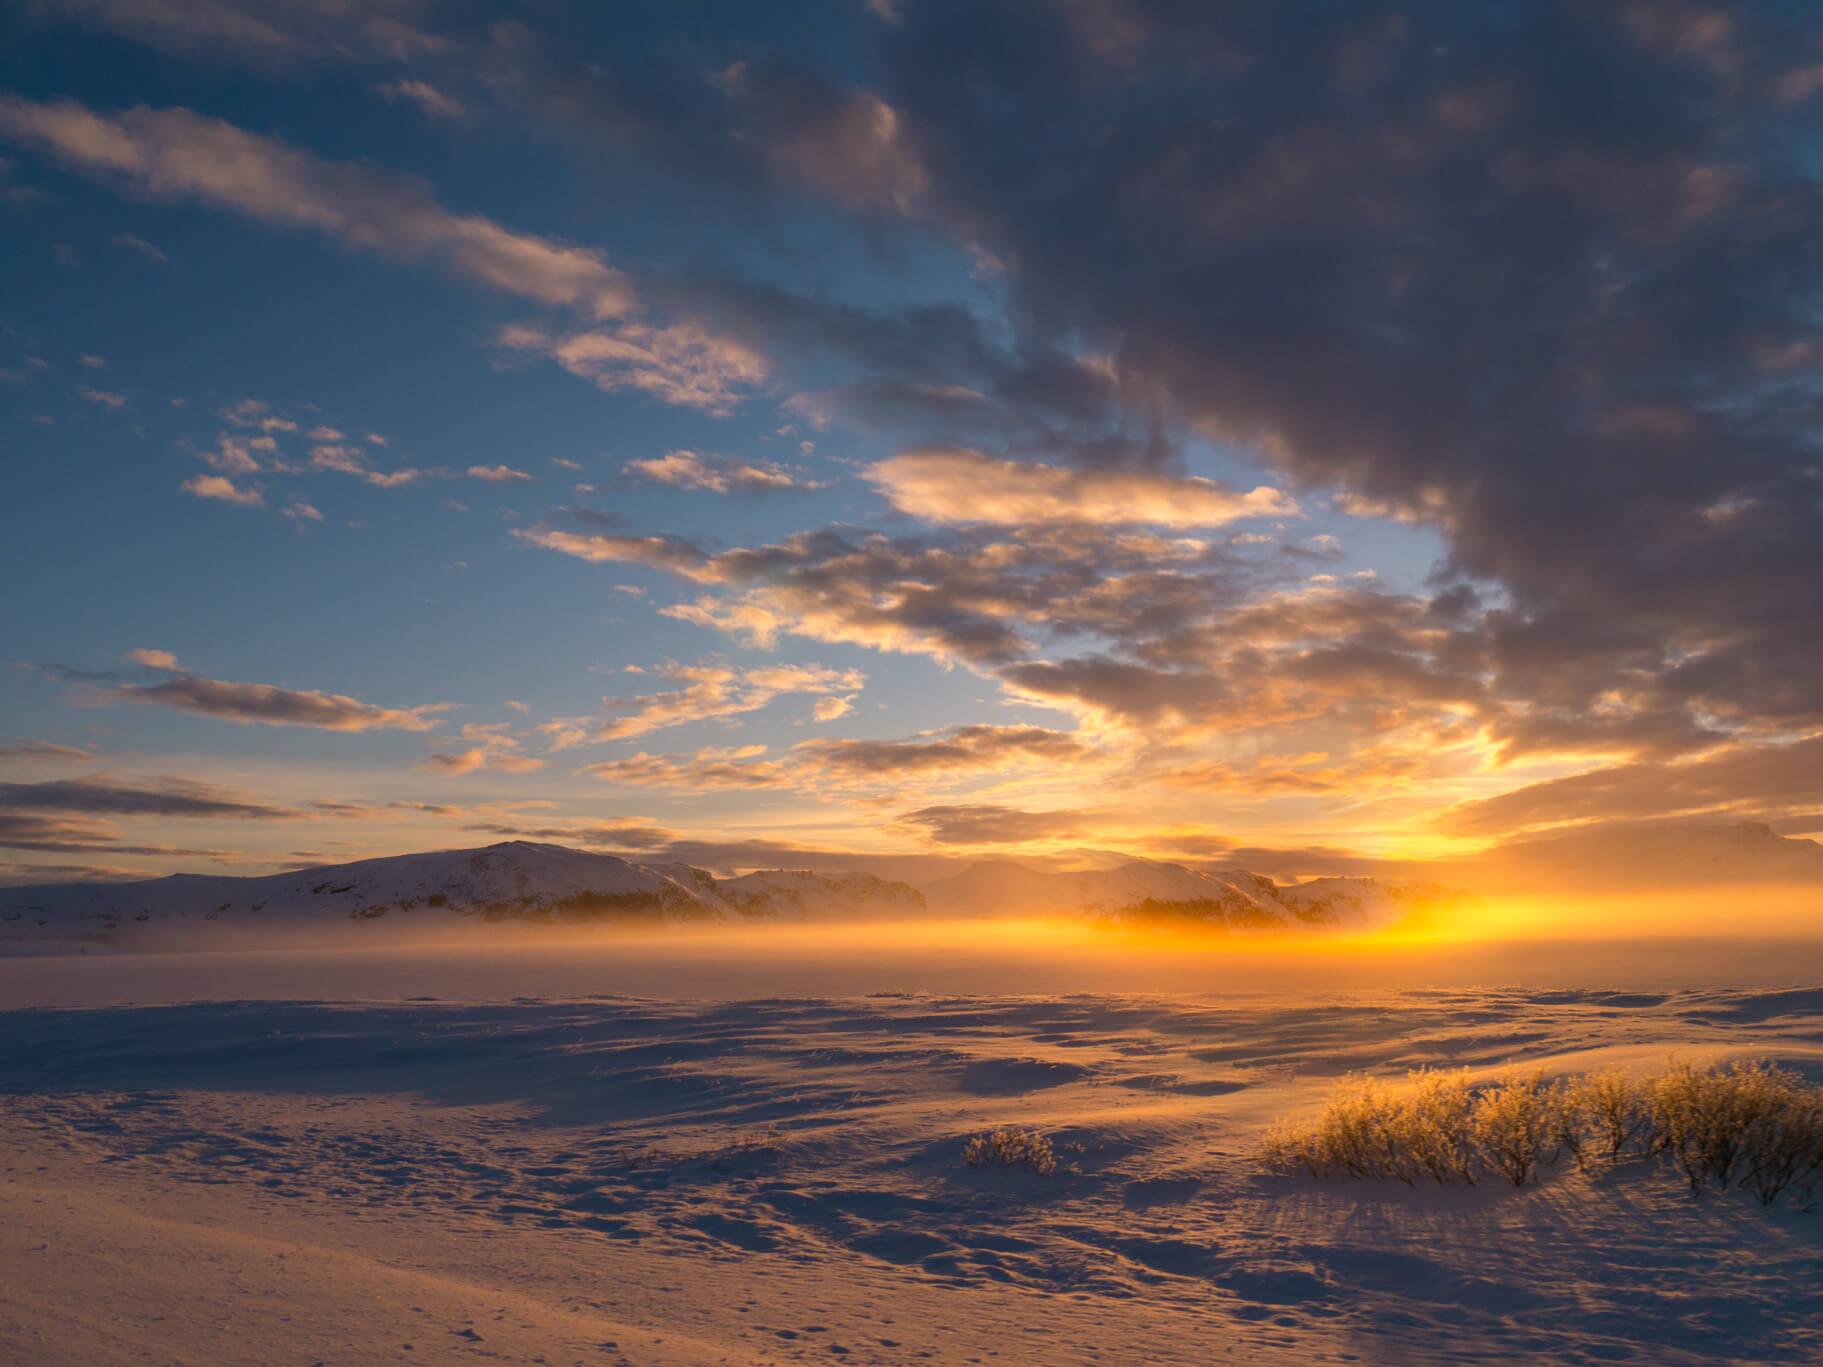 island goldener-ring schnee sonne sonnenuntergang wolken